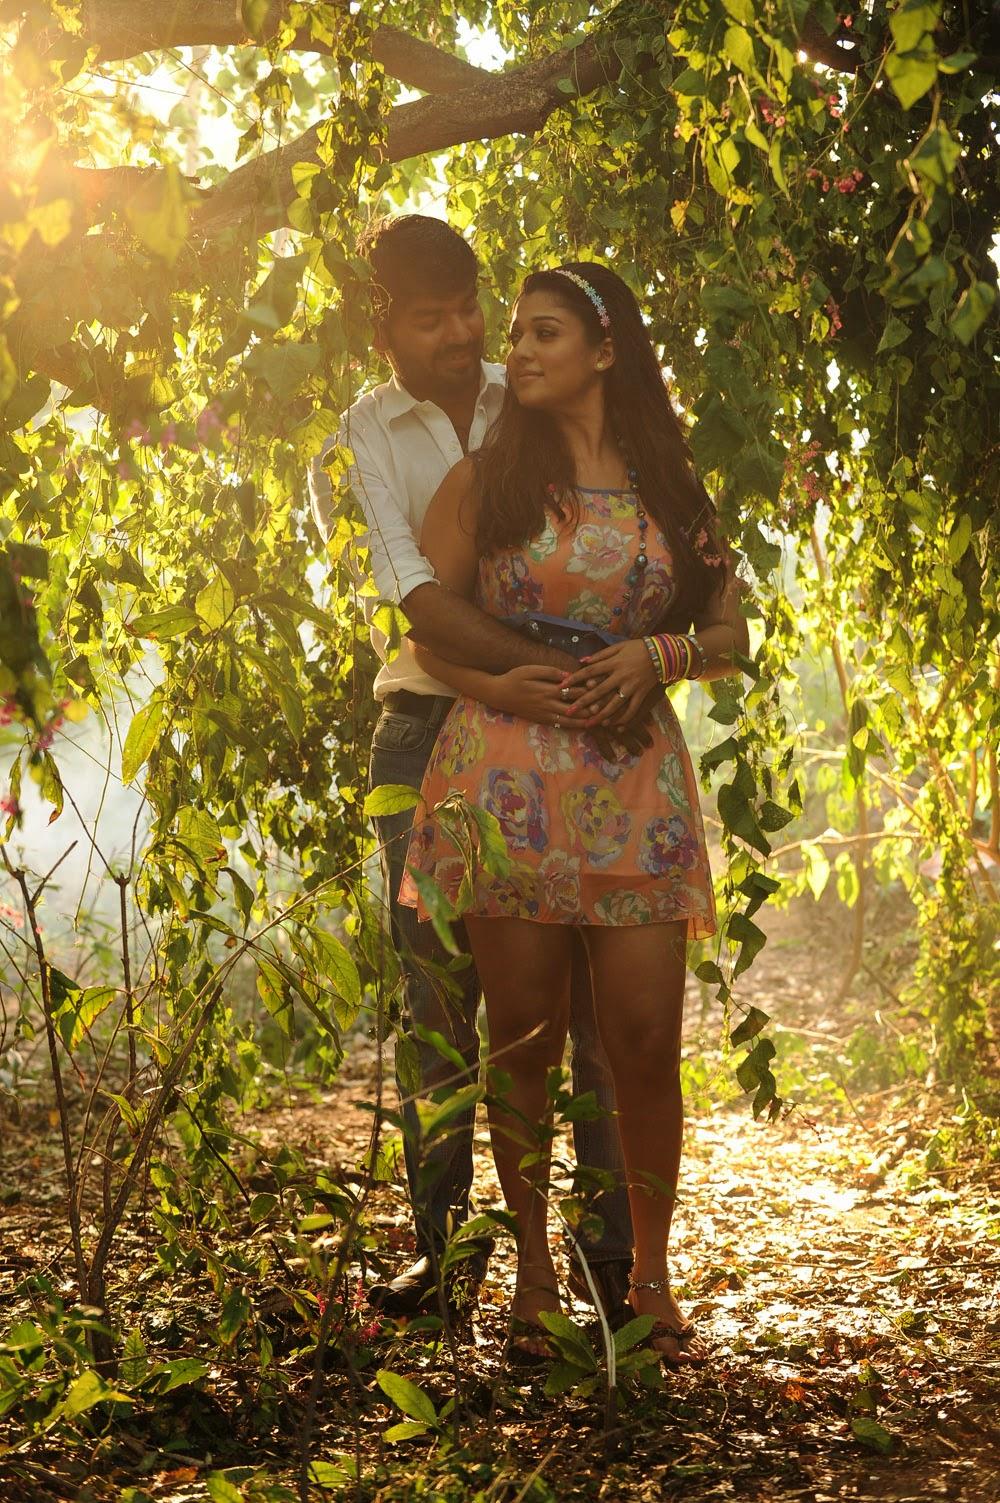 Raja Rani Hd Wallpapers With Quotes Raja Rani Movie Stills No1hdwallpapers